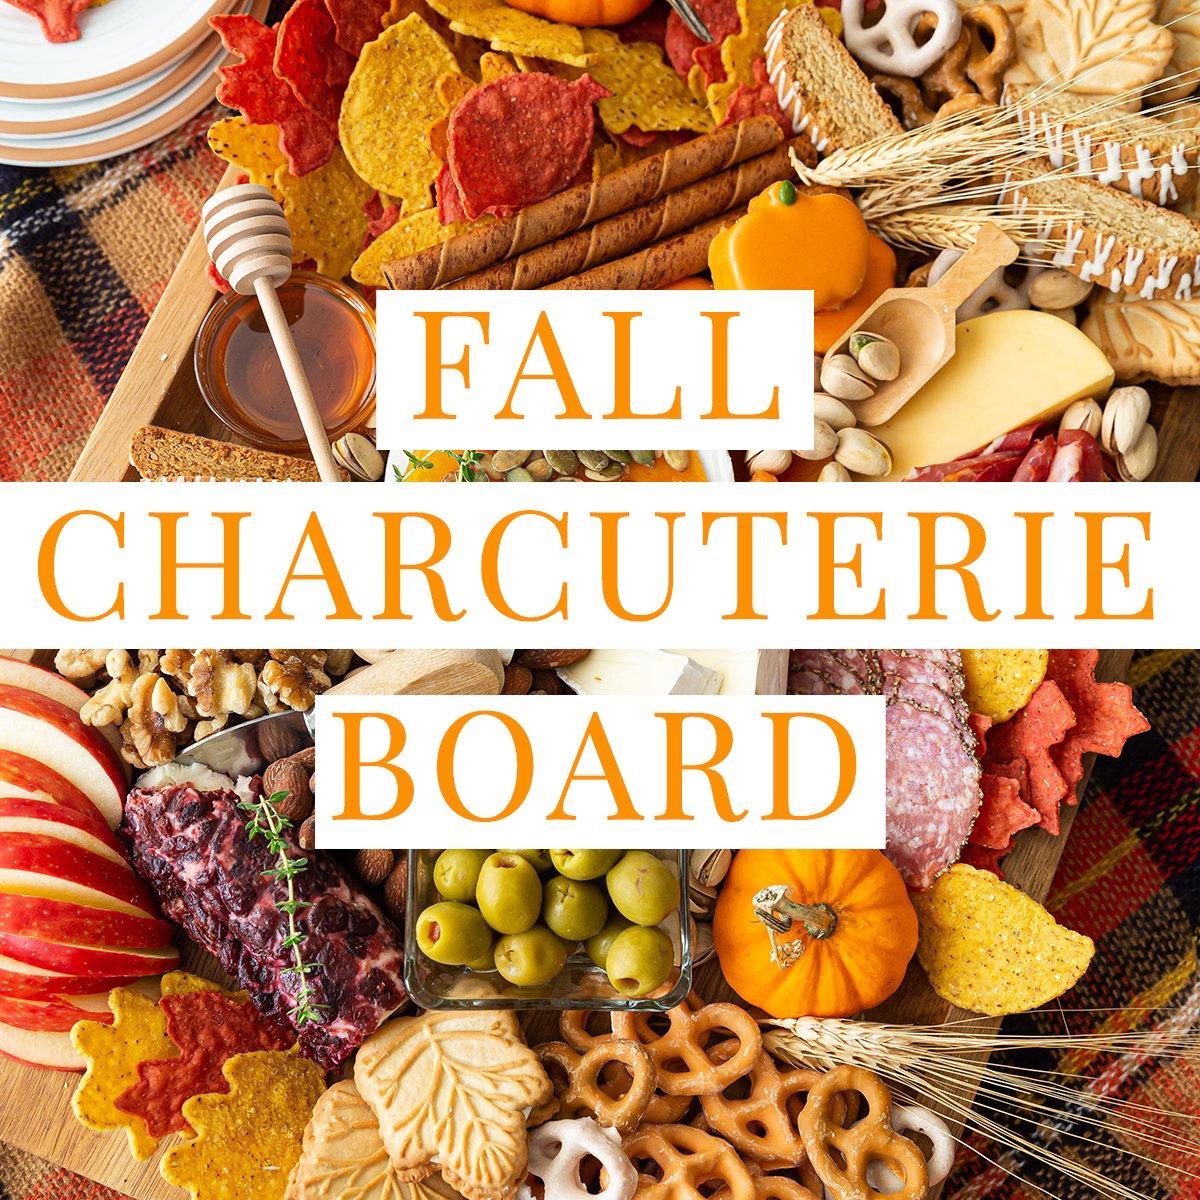 Fall Charcuterie board Ideas